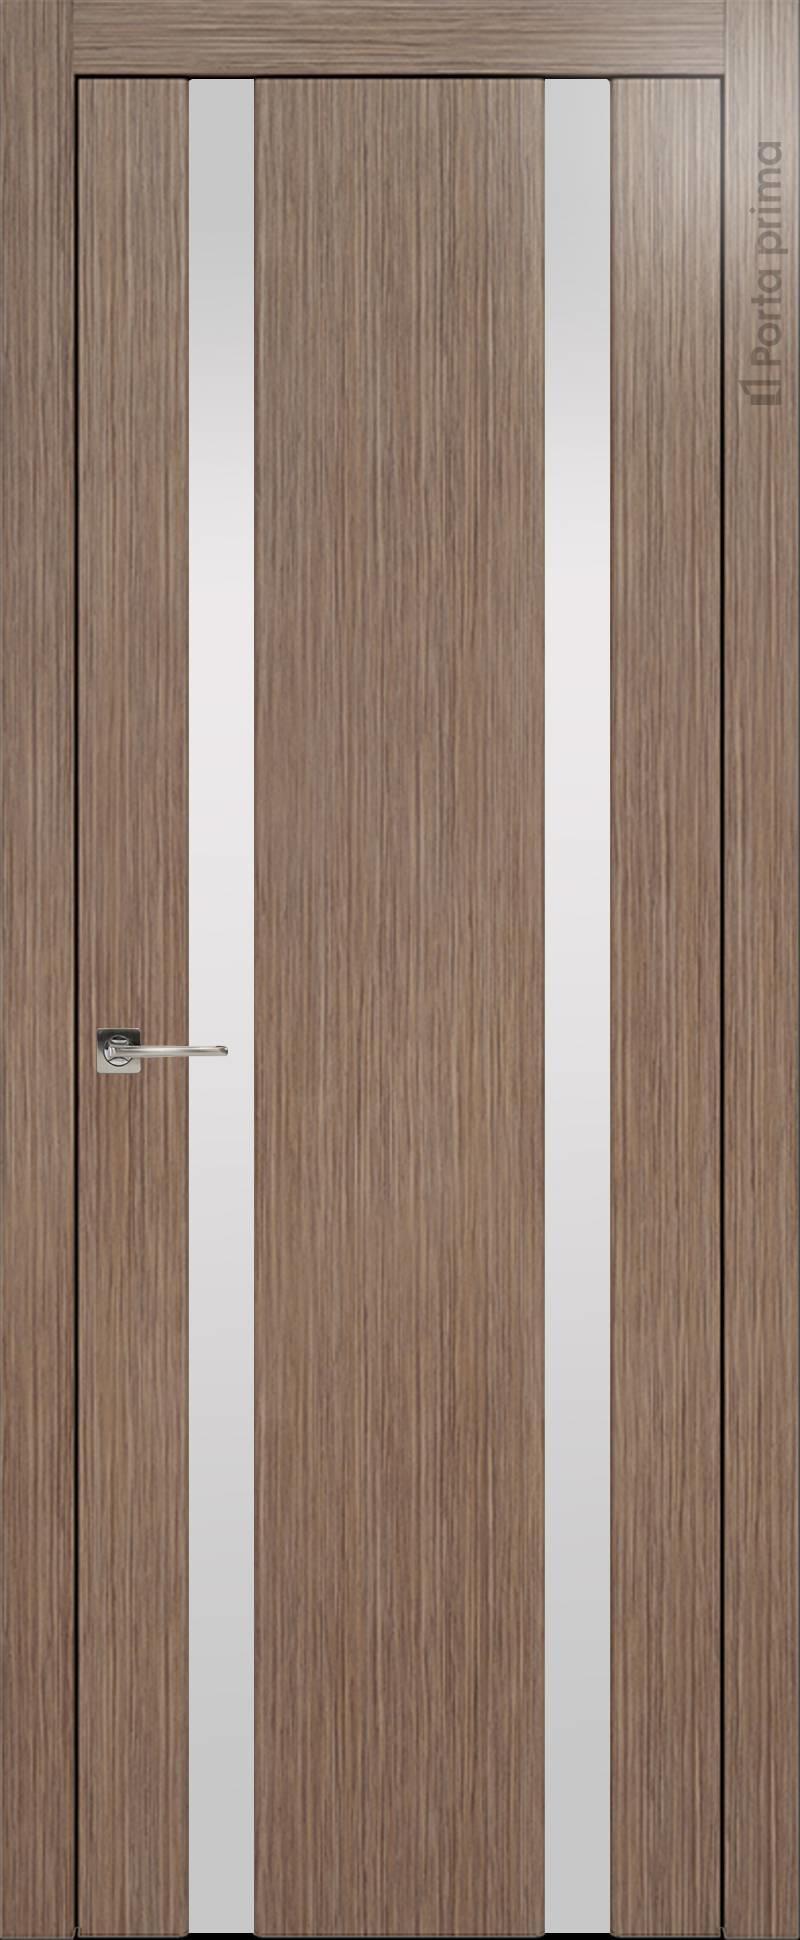 Torino цвет - Орех Без стекла (ДГ-2)